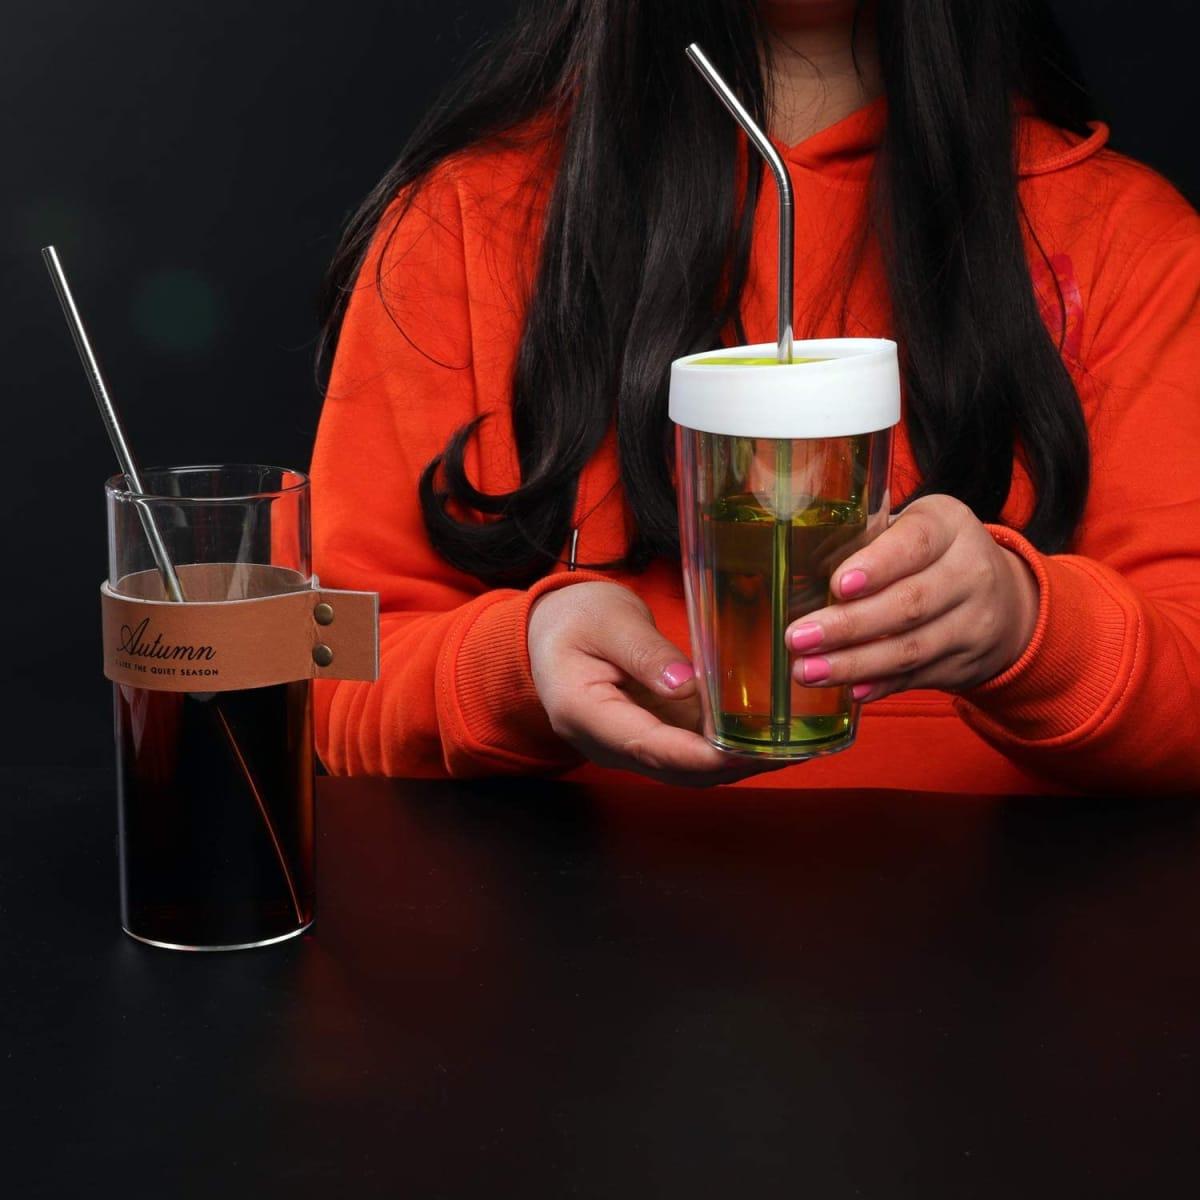 stainless steel drinking straws uk